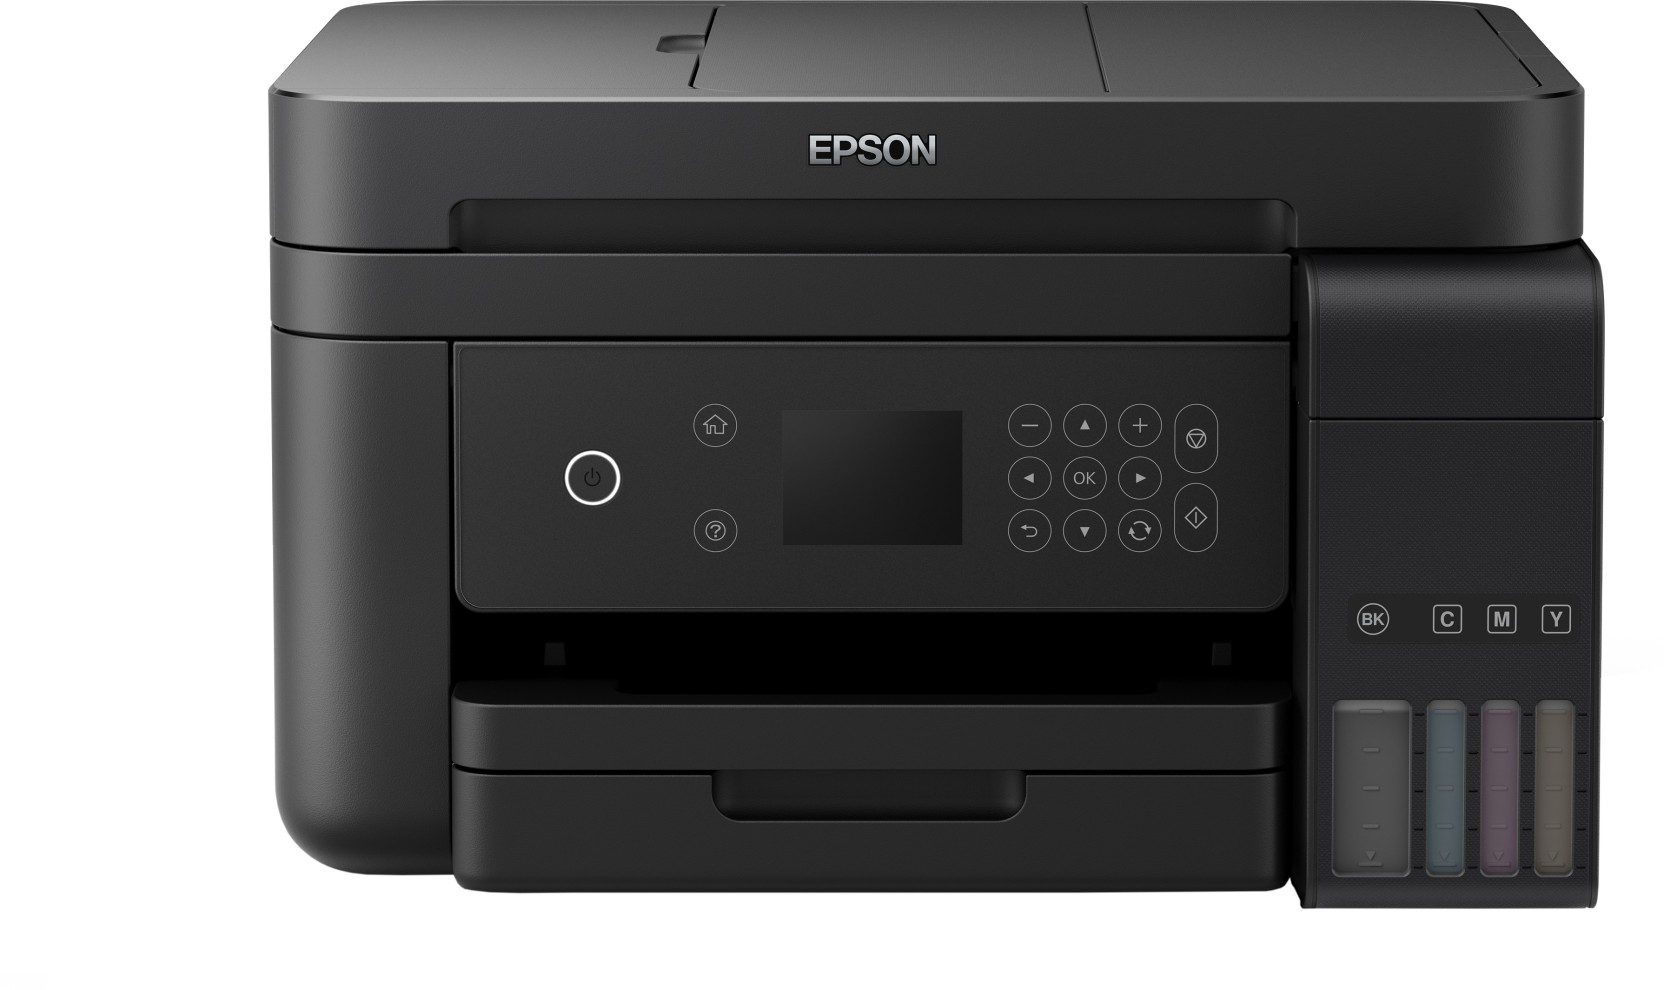 Epson L6170 Multi Function Wireless Printer Fast Print Black 100ml Dye Based Photo Premium Add To Cart